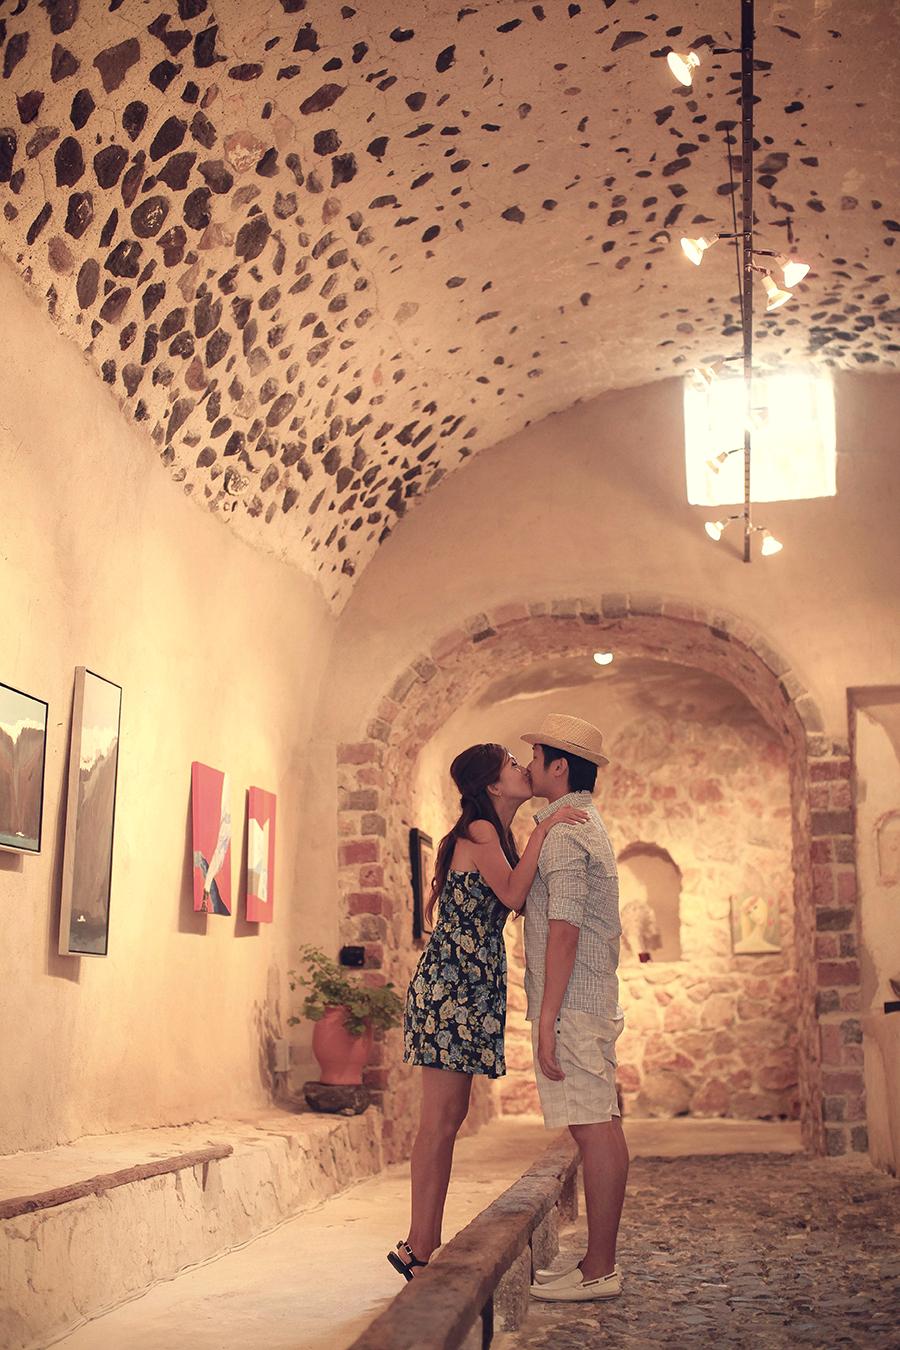 santorini greece . wedding photography by kurt ahs . 3115.jpg